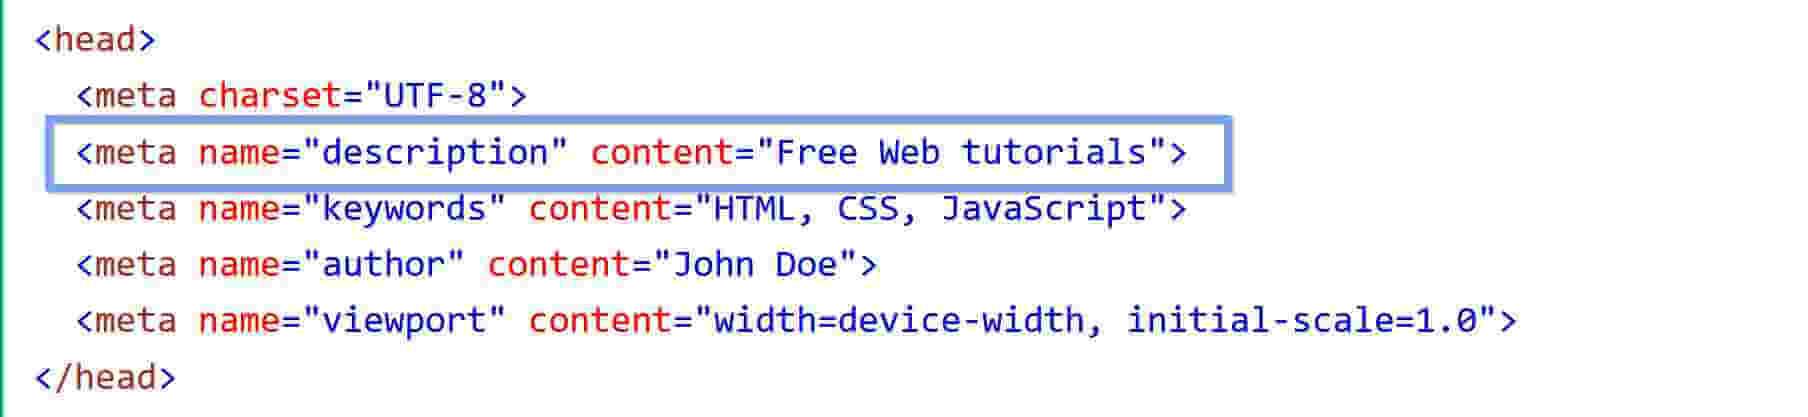 Meta Beschreibung in den HTML Code schreiben